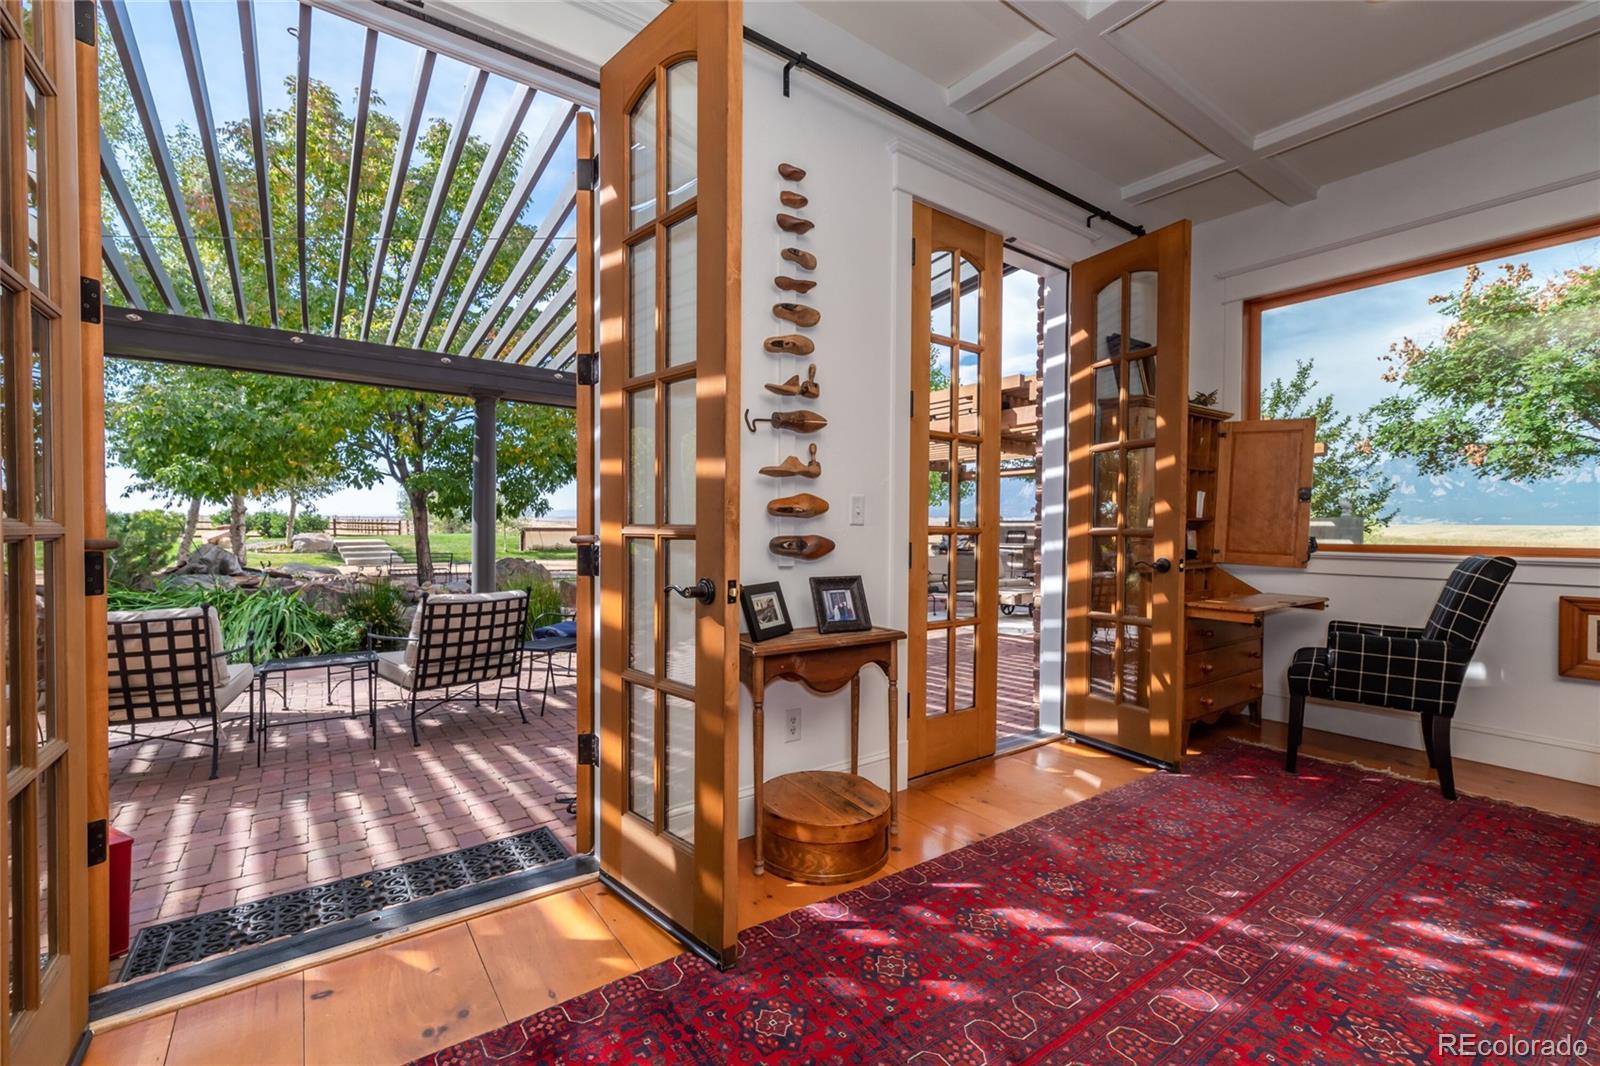 French Doors open to outdoor living area